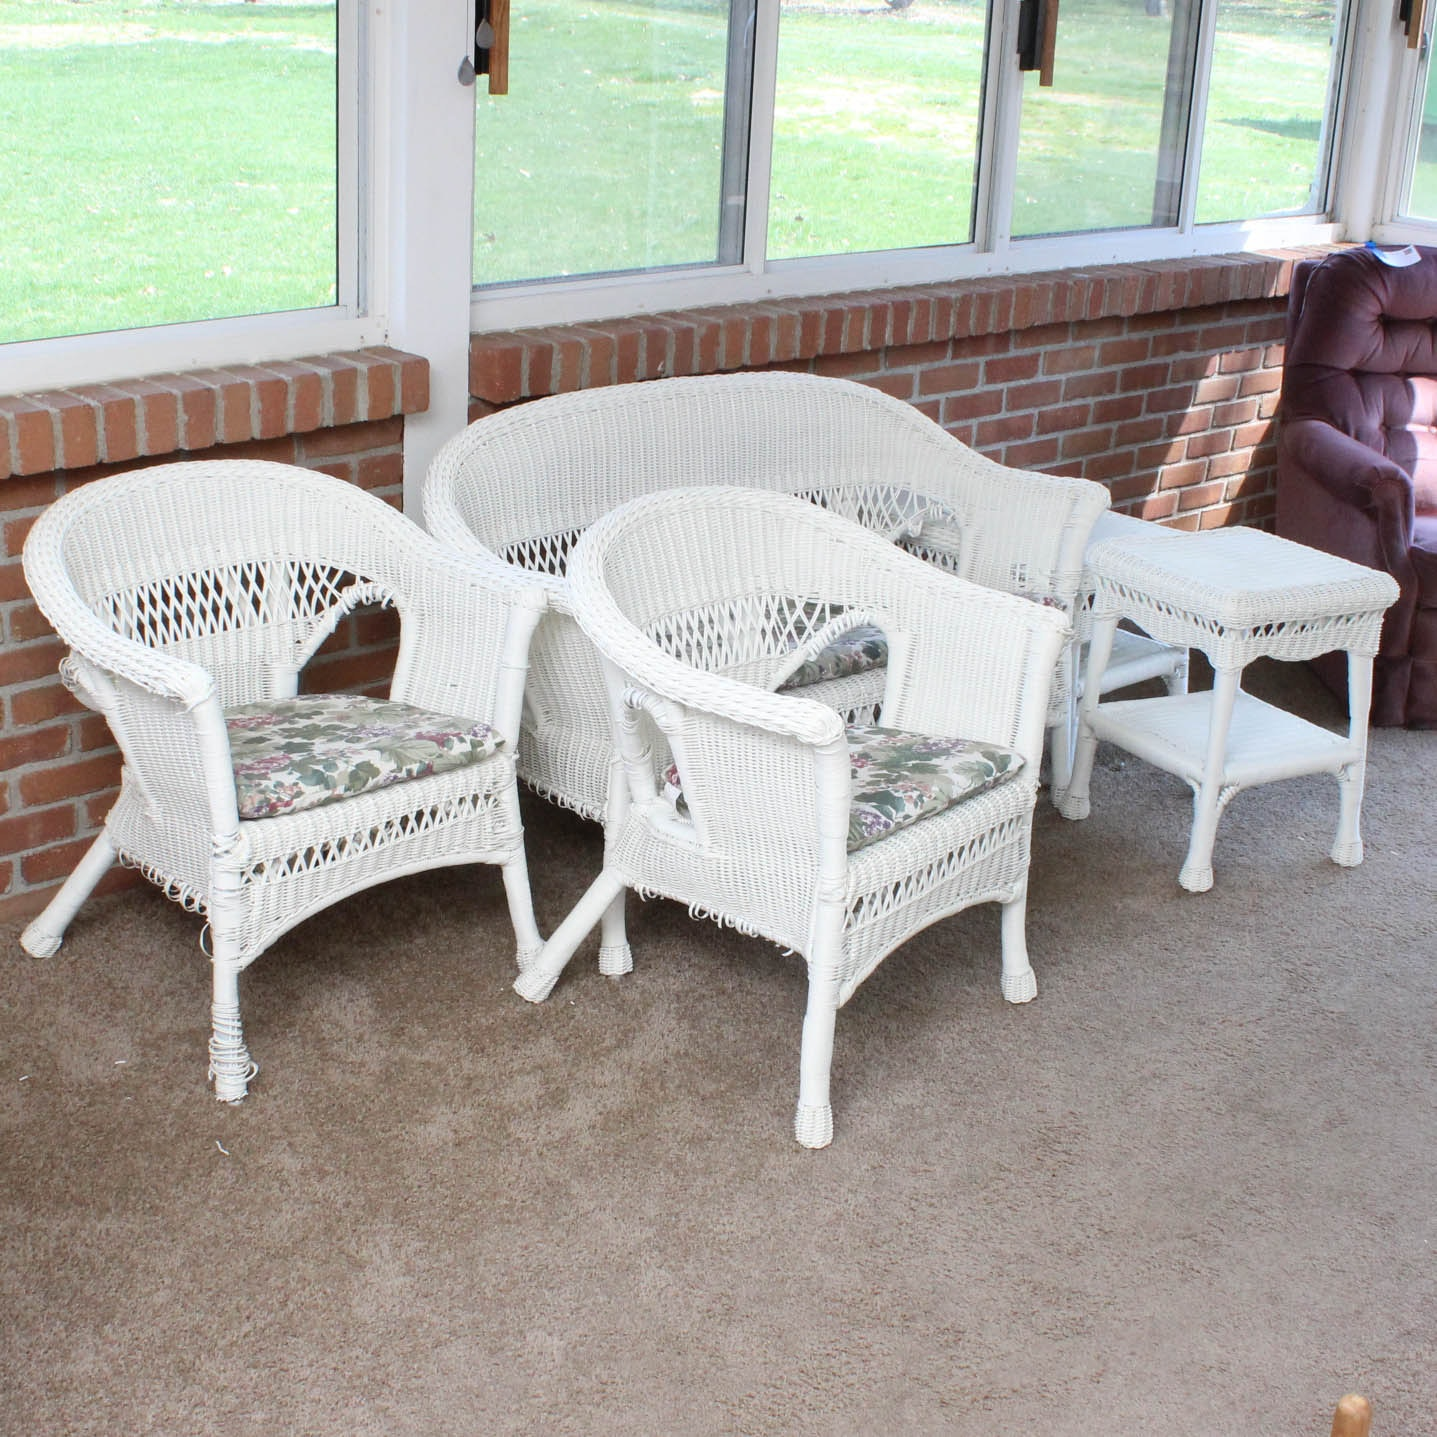 Wicker Style Patio Furniture